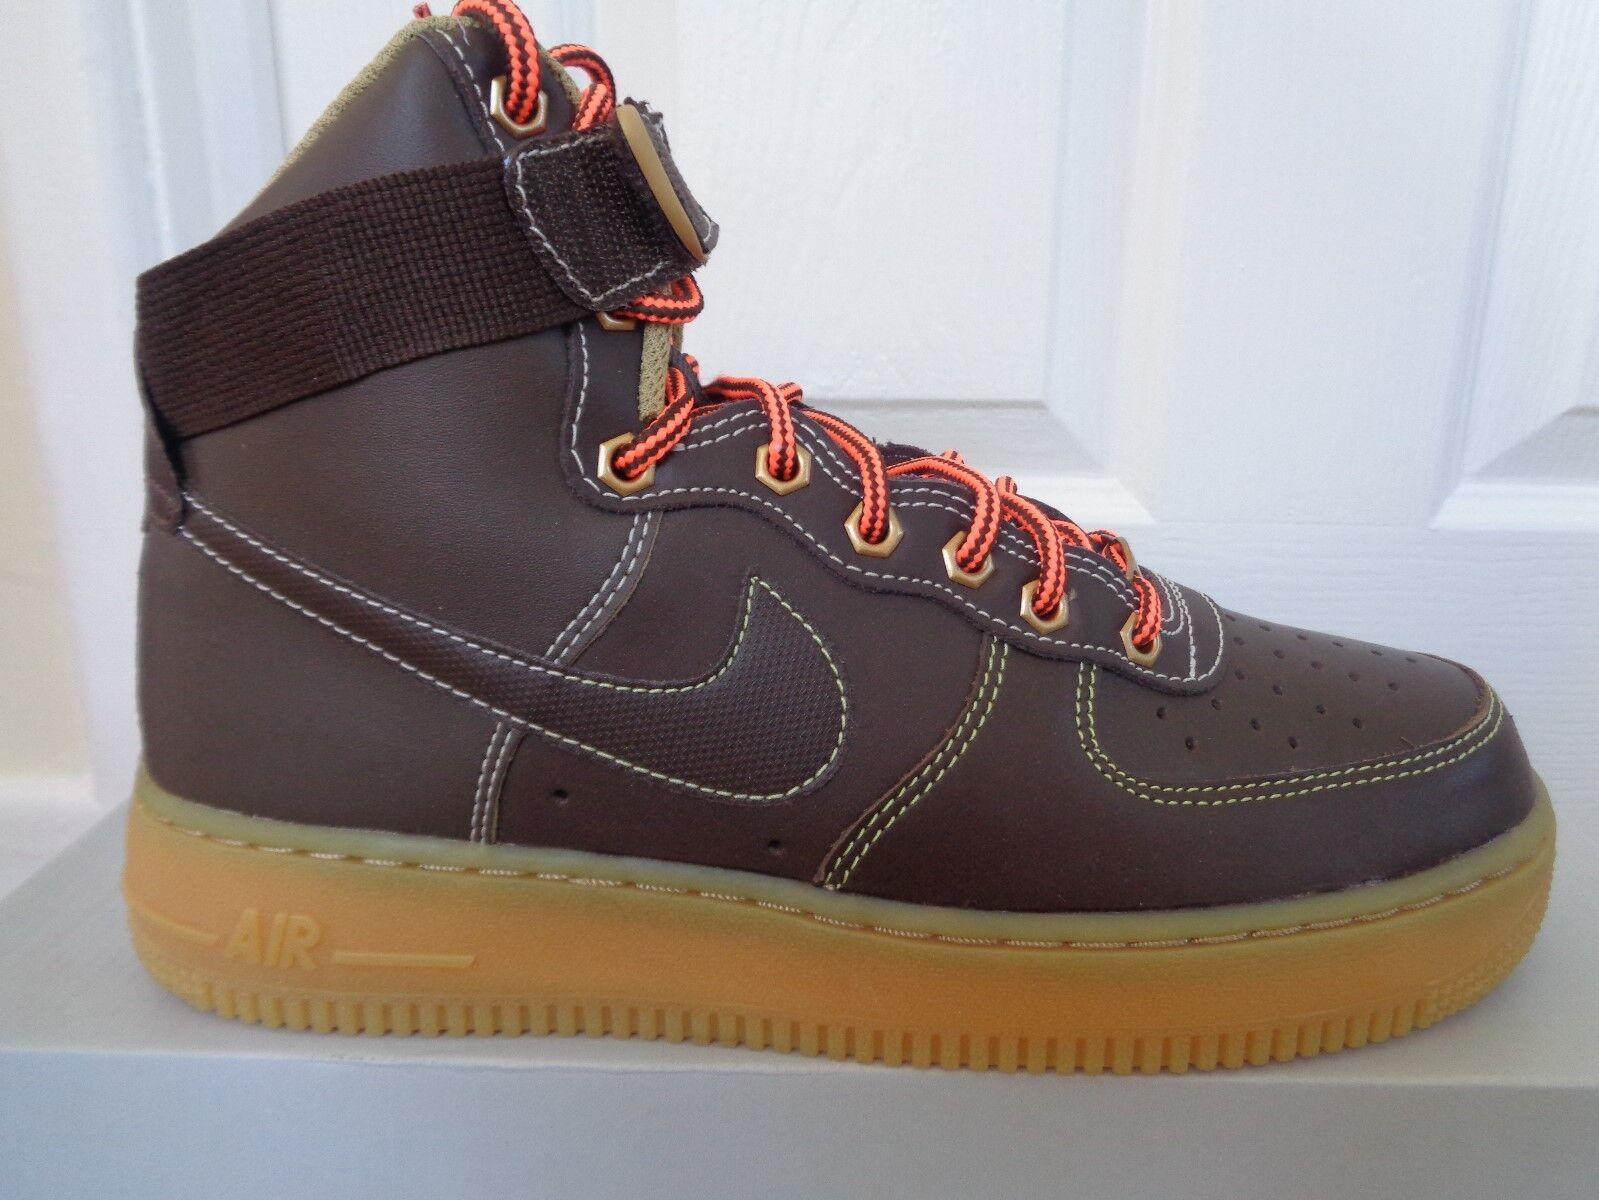 Nike Air Force 1 High '07 trainers Stiefel 315121 203 uk 6 eu 40 us 7 NEW IN BOX  | Großartig